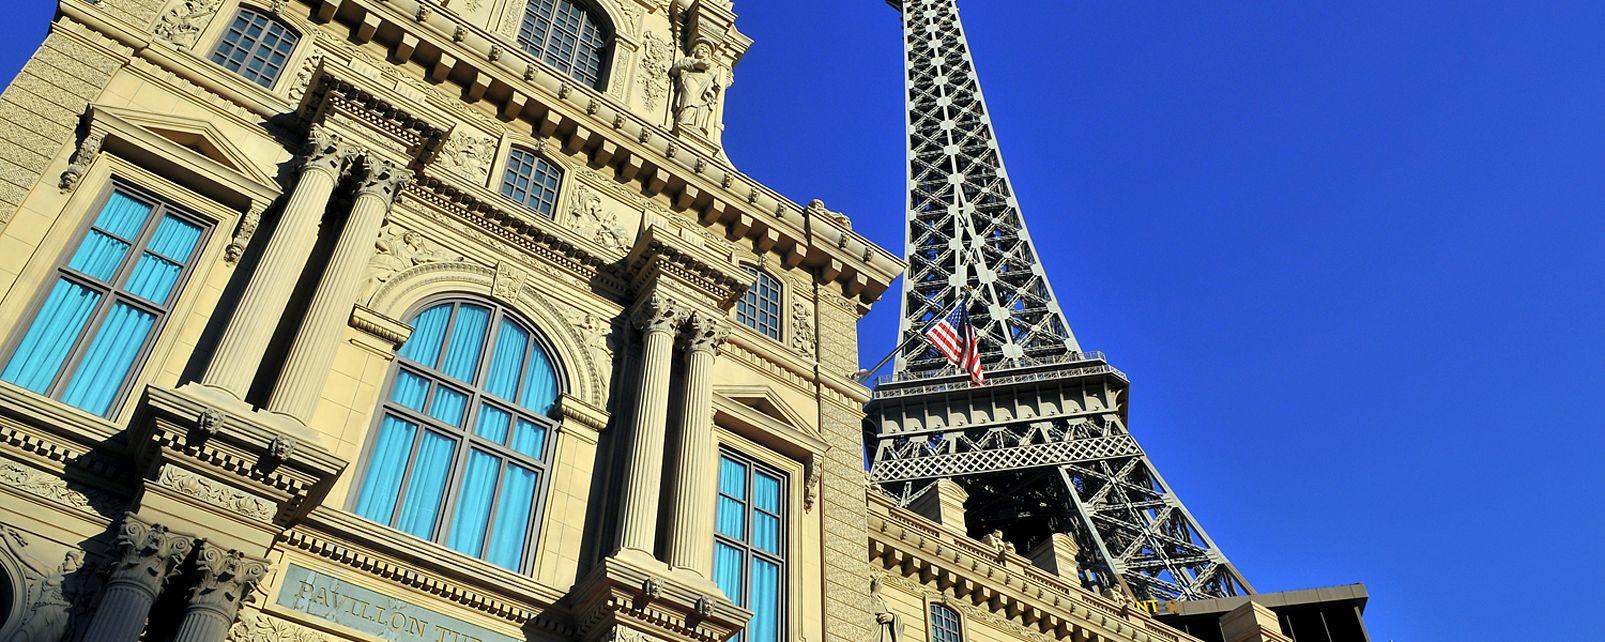 Hôtel Paris Las Vegas